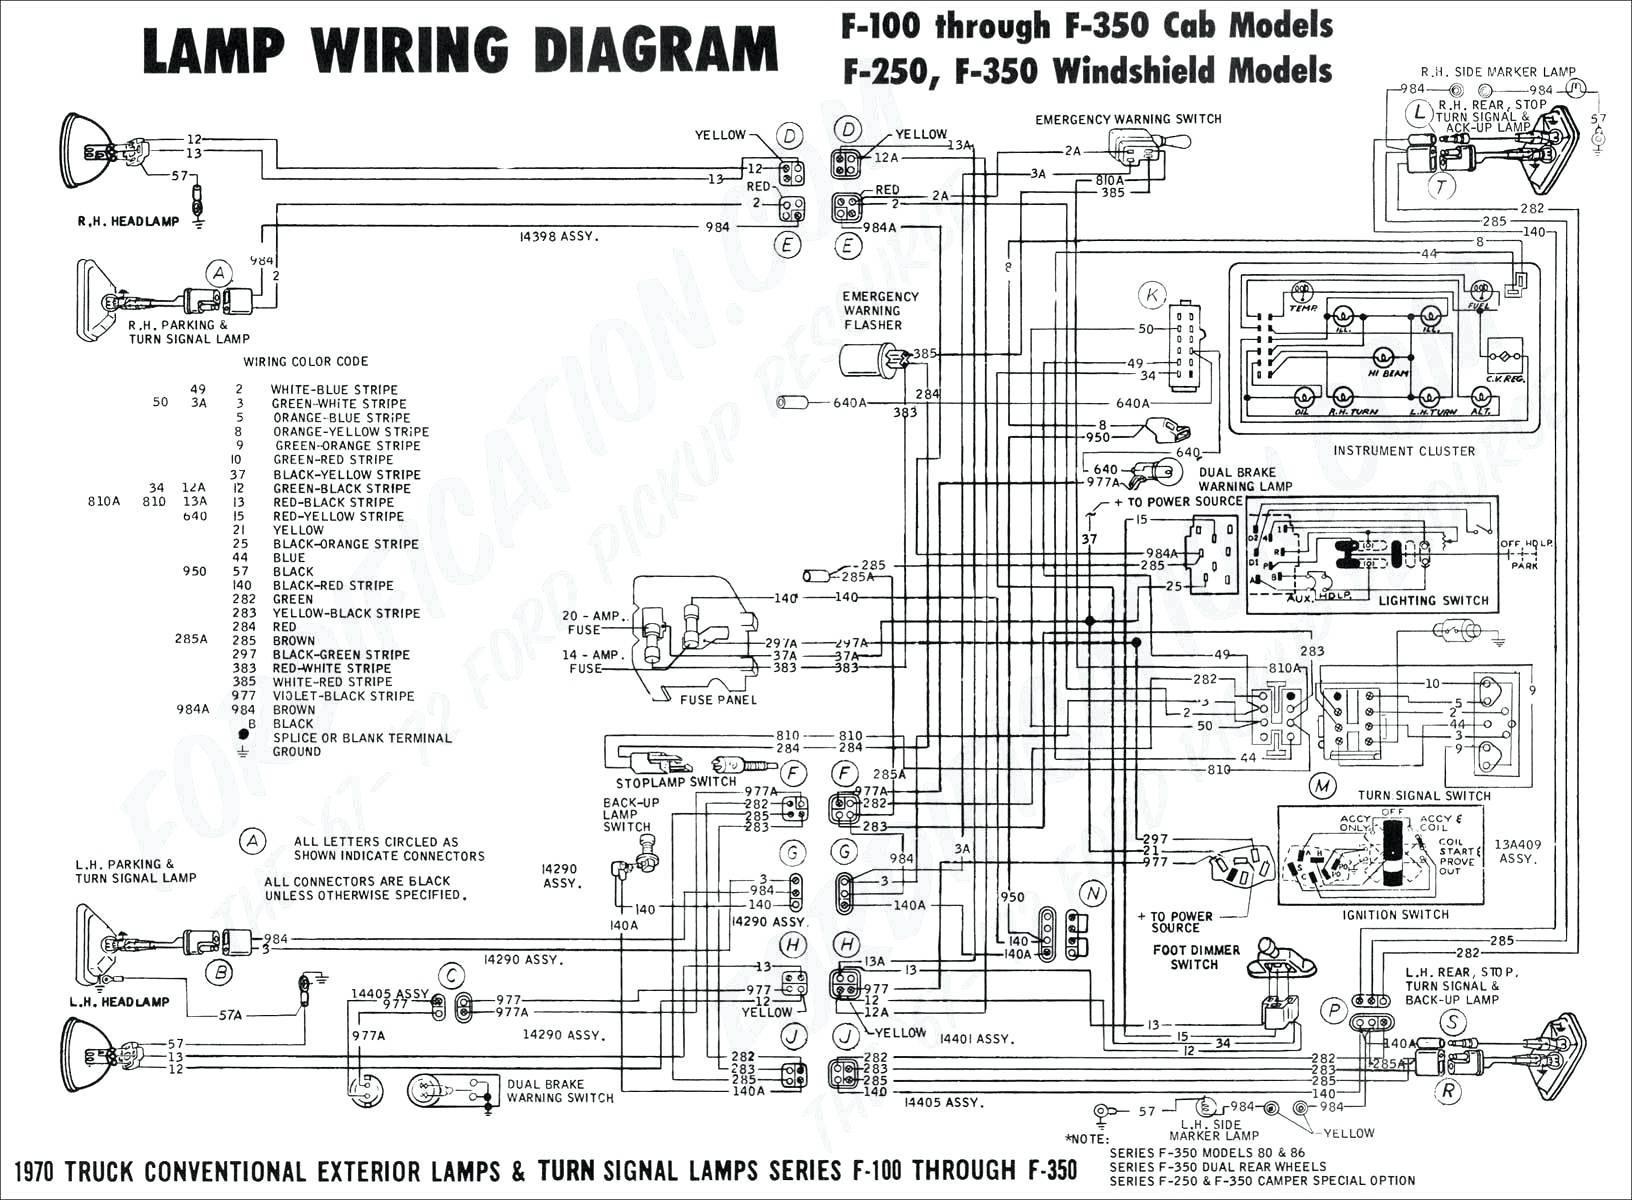 2004 Chevy Silverado Tail Light Wiring Diagram 2005 Chevy Silverado Tail Light Wiring Diagram Unique Lovely Trailer Of 2004 Chevy Silverado Tail Light Wiring Diagram